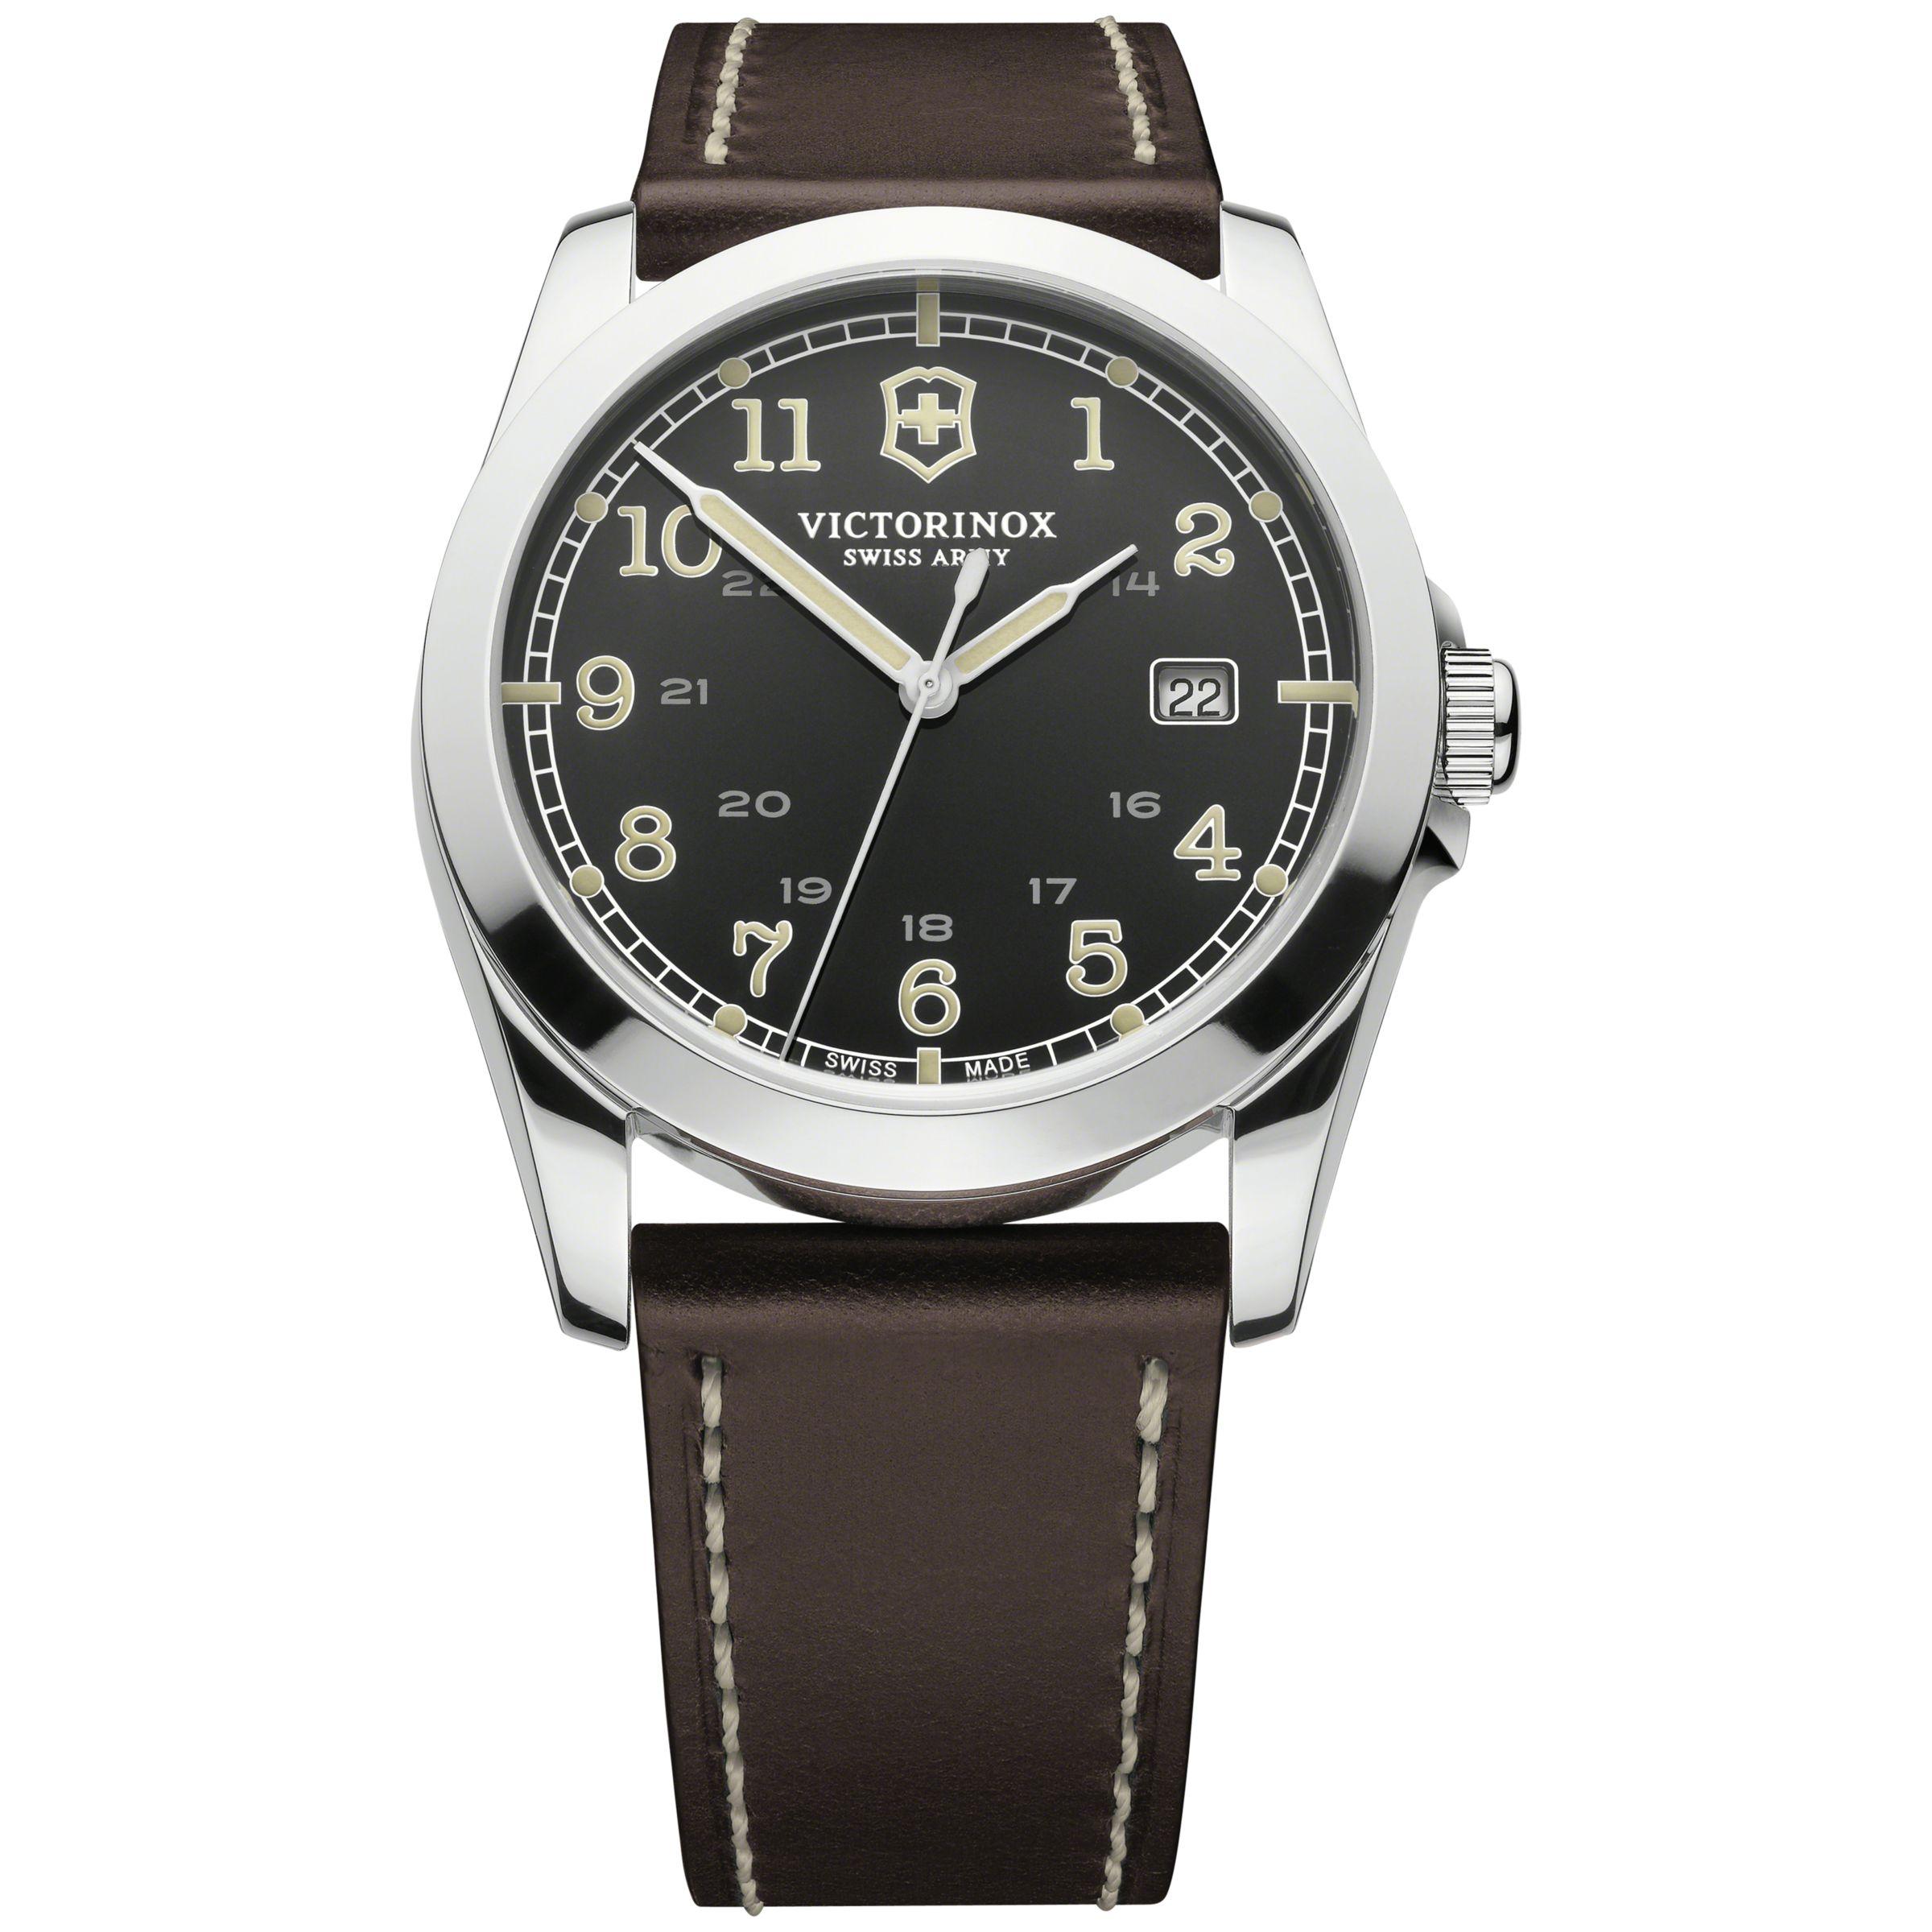 Victorinox Victorinox Men's Infantry Vintage Leather Strap Watch